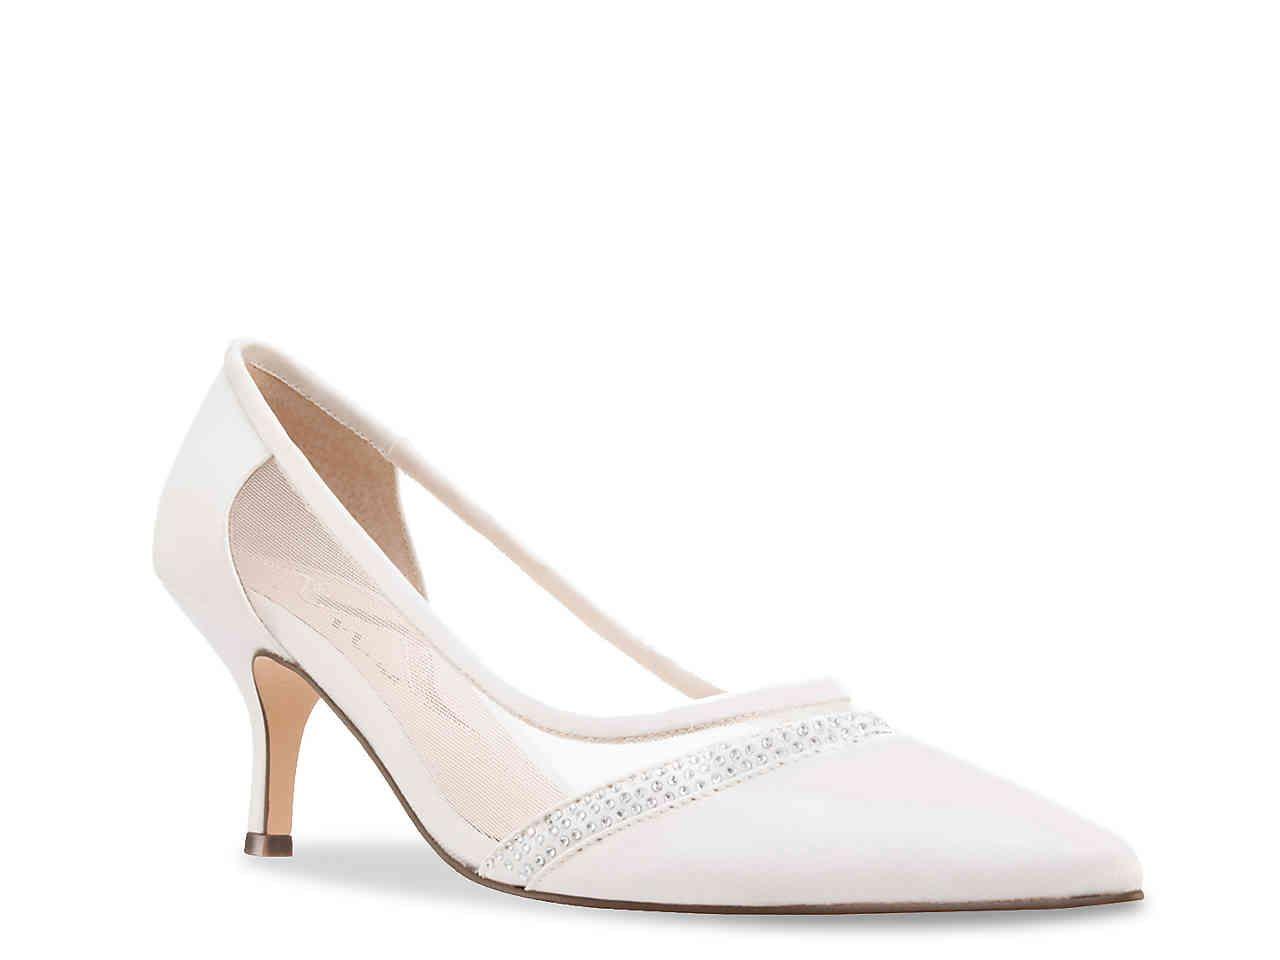 Wedding shoes | Pumps, Shoes, Nina shoes